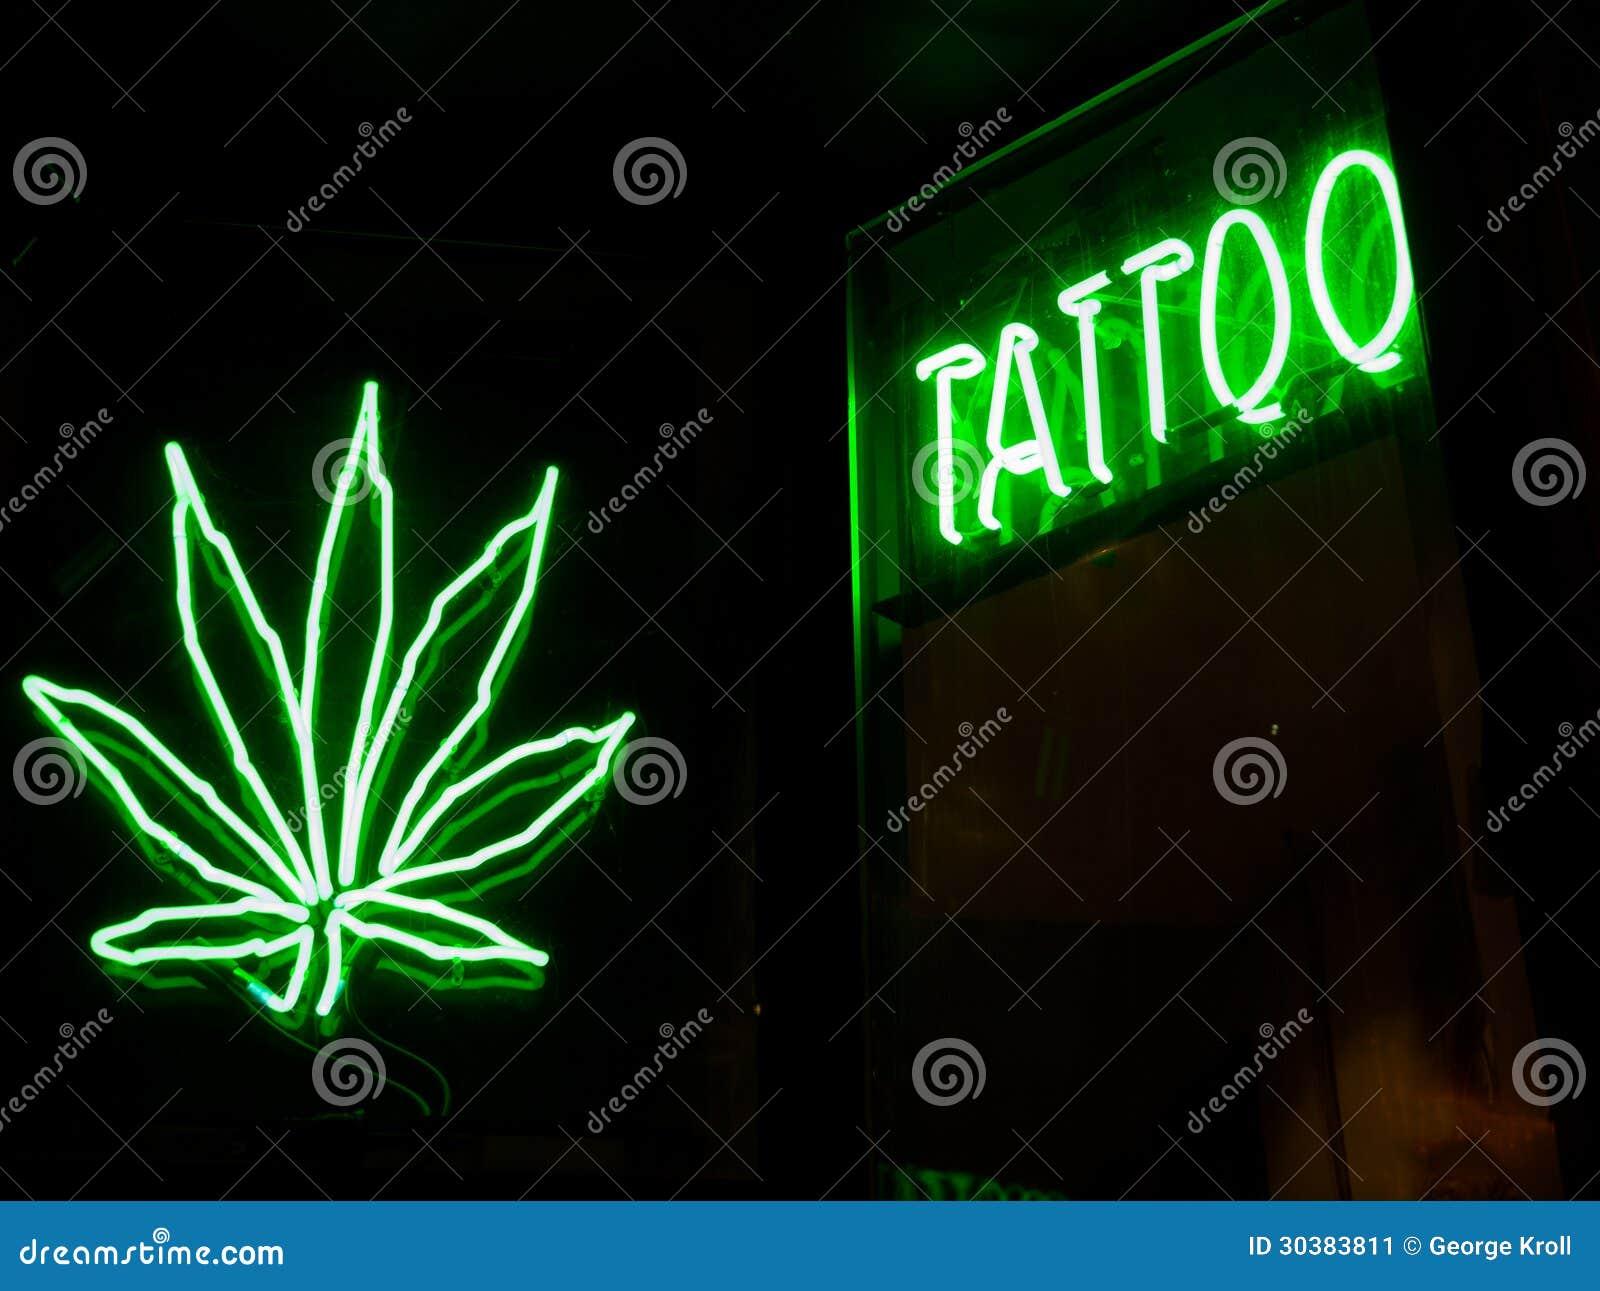 Tatto And Marijuana Neon Signs Stock Image Image Of Leaf